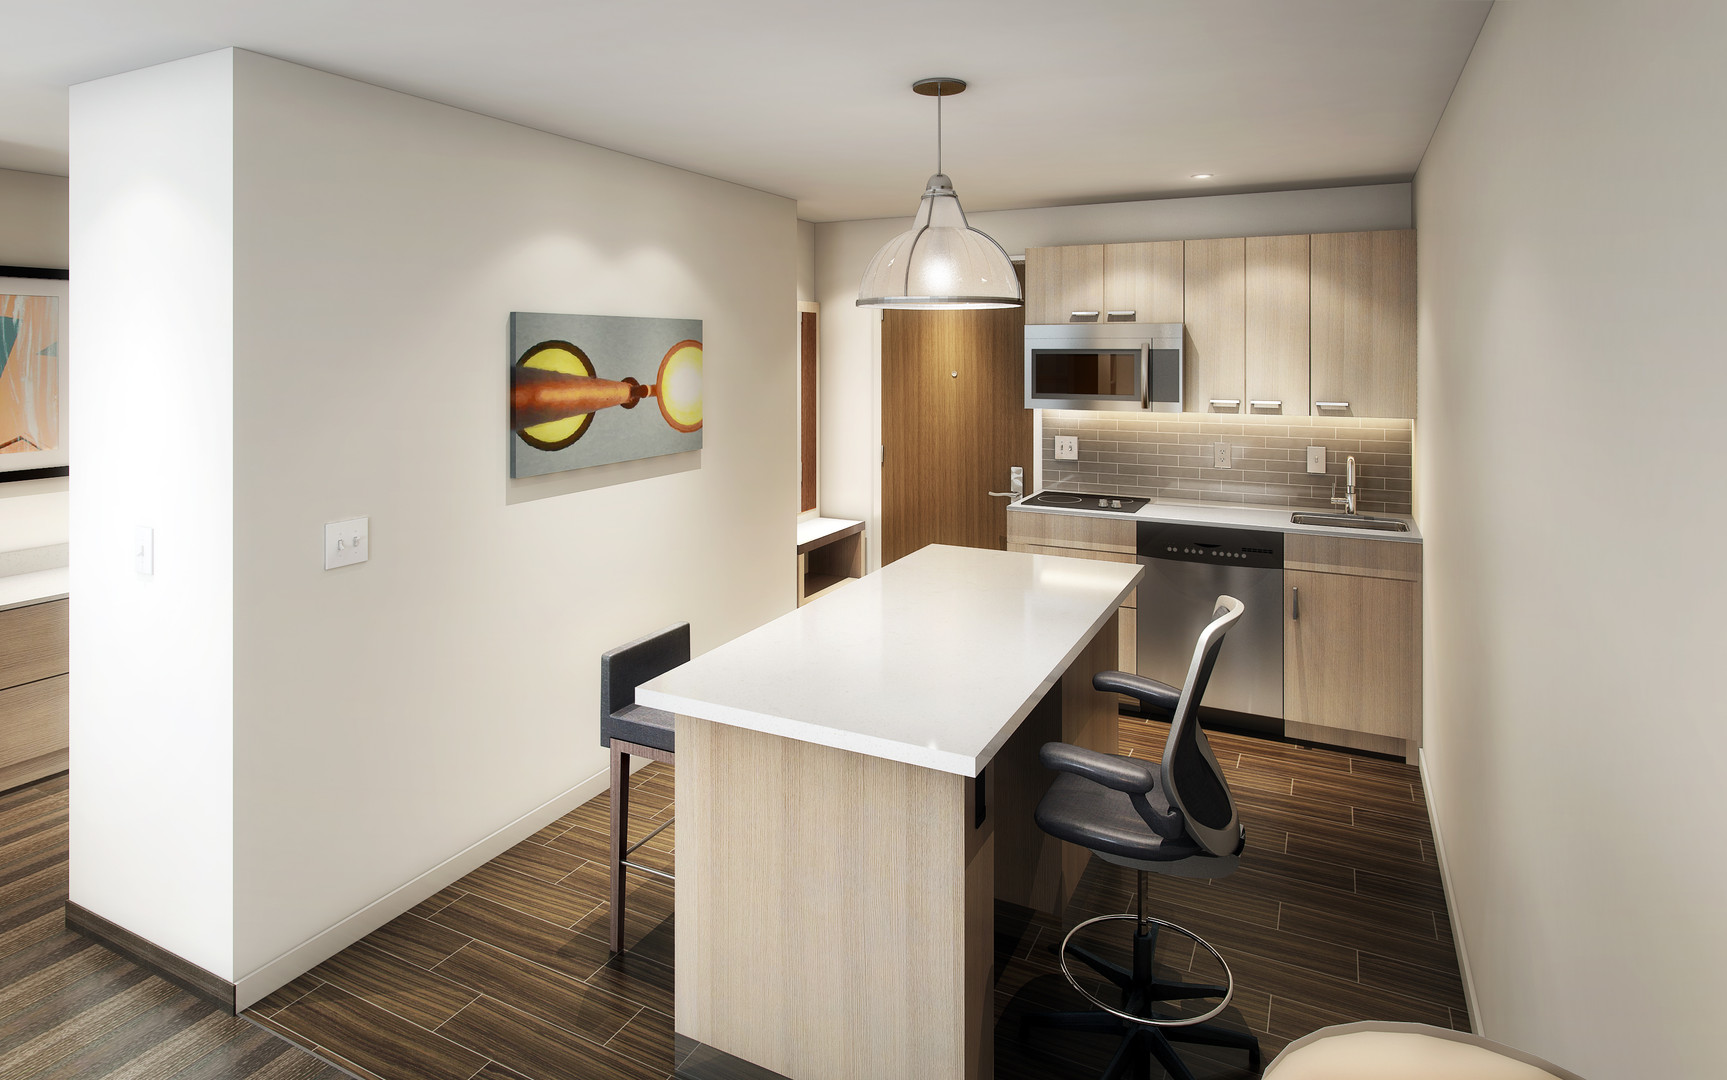 Hyatt House King Studio Guest Kitchen.jp